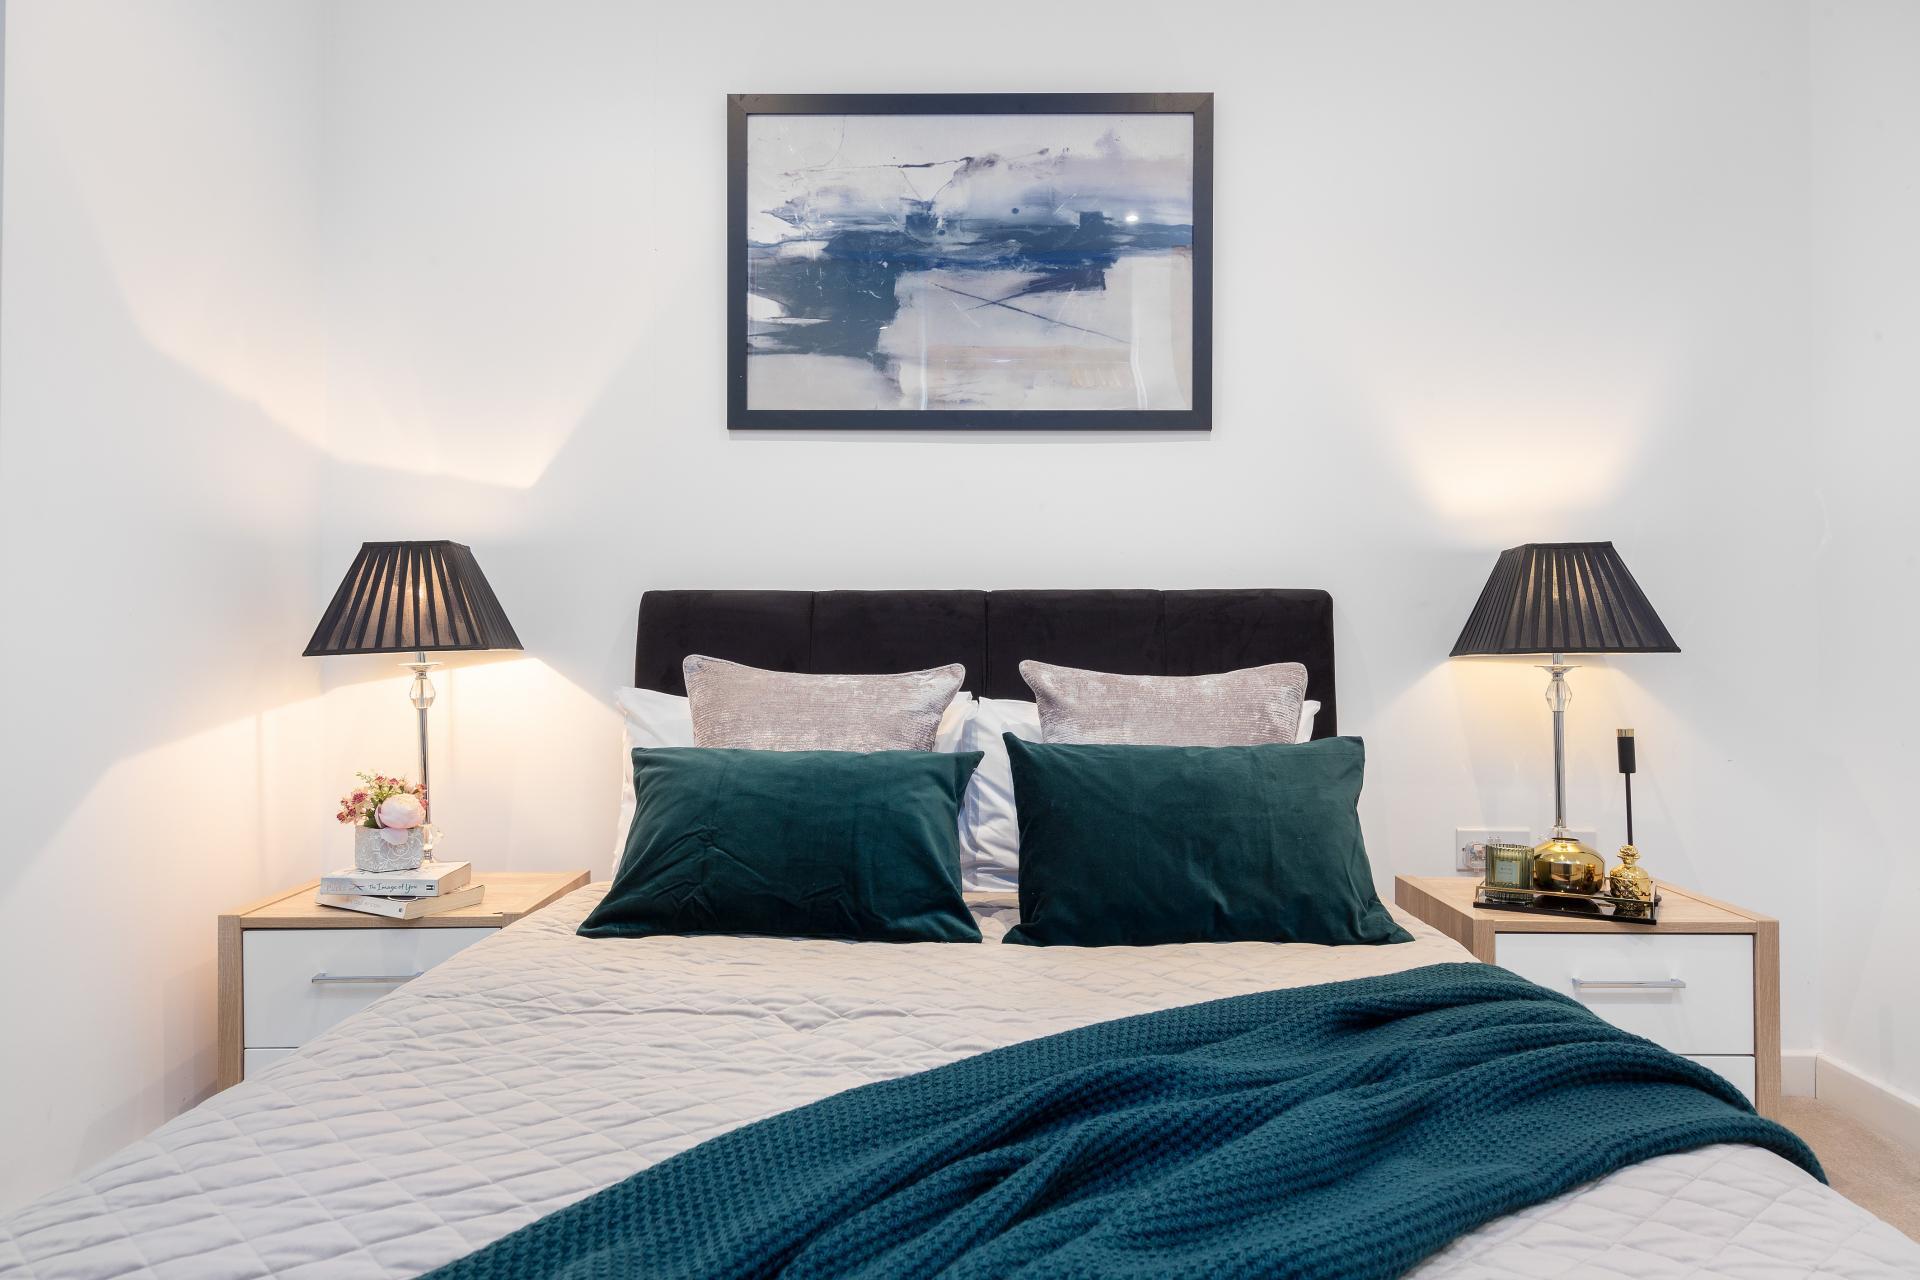 Bedspread at Lexicon Book House Apartments